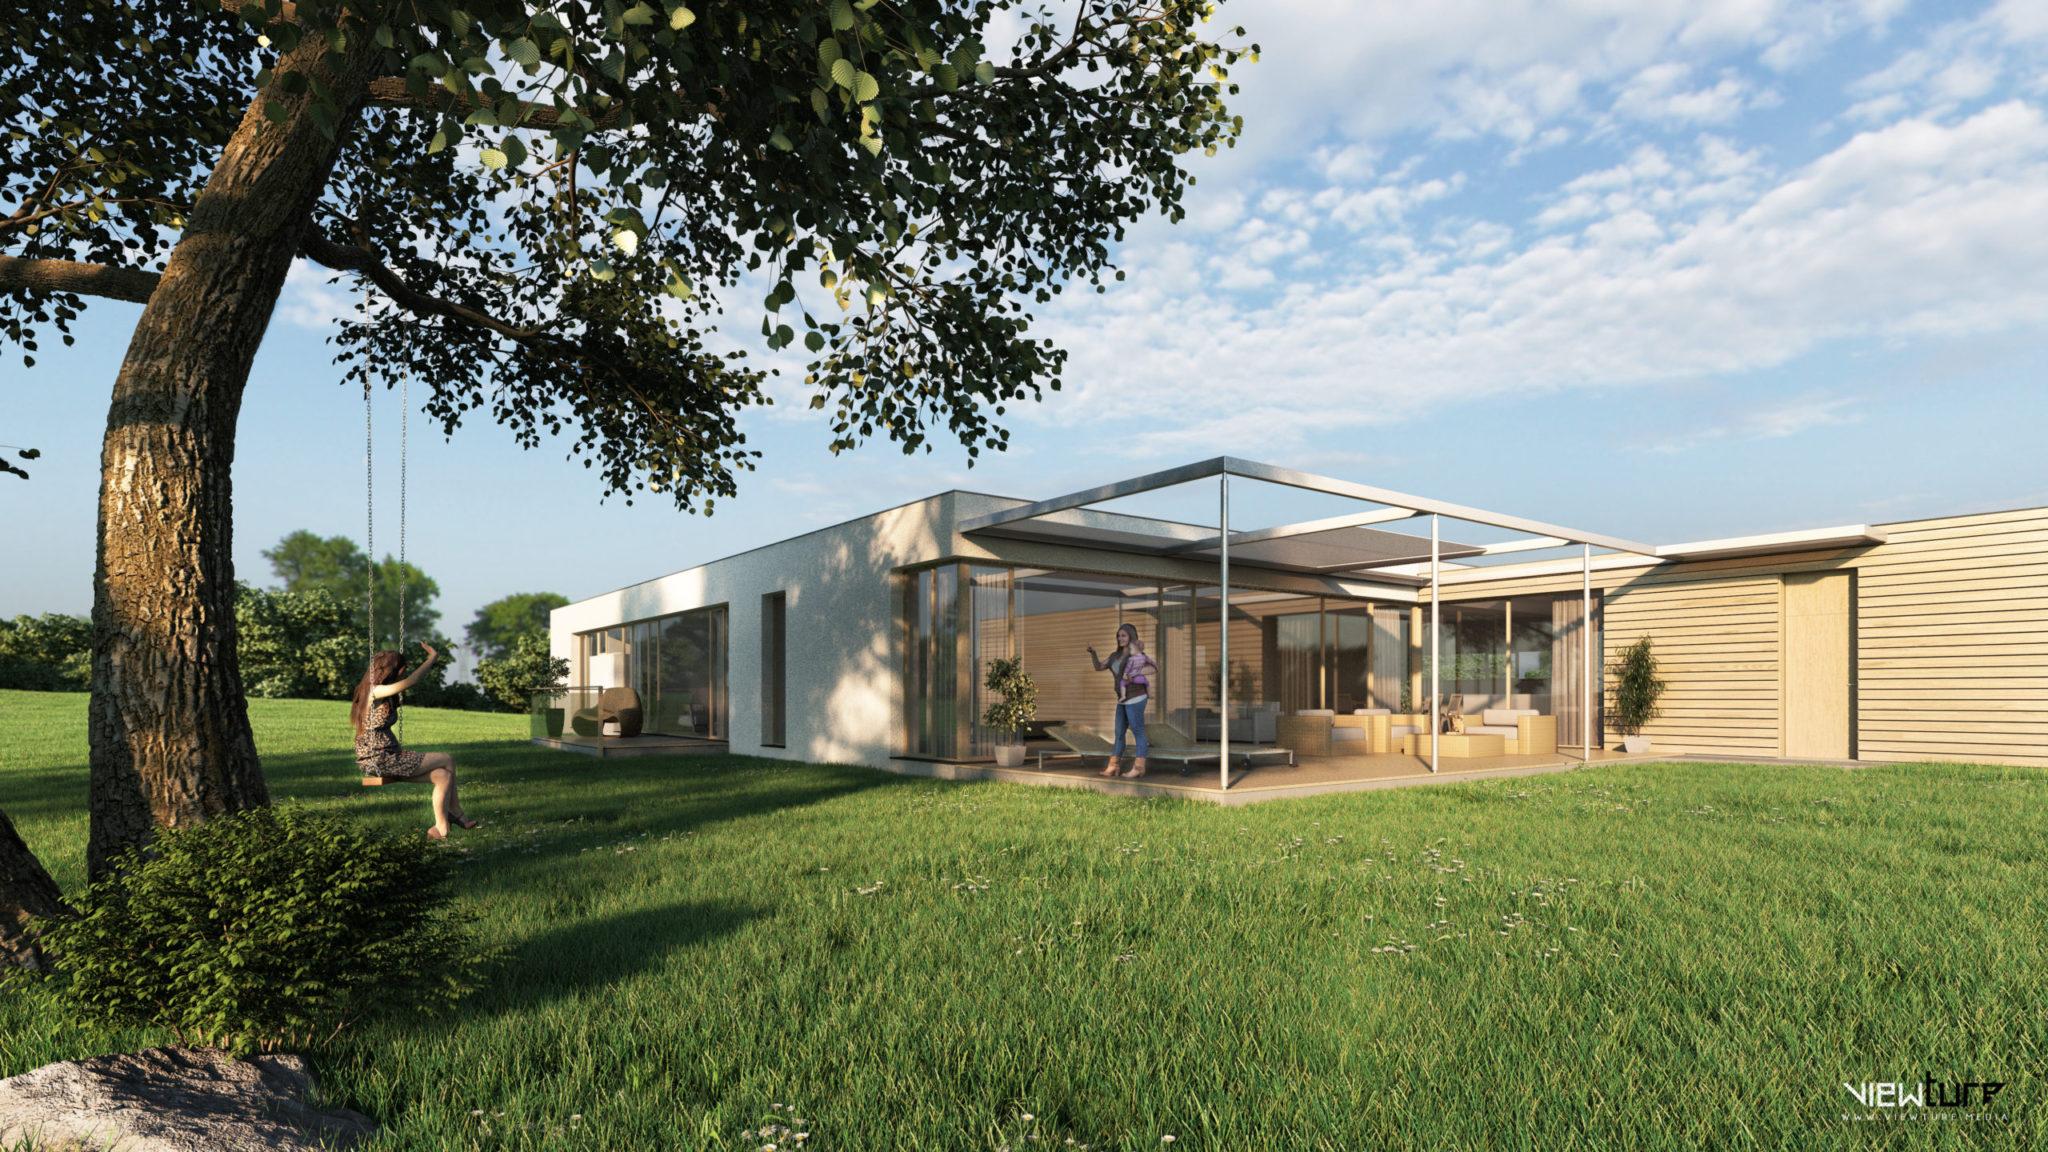 viewture bungalow exterior - Viewture Visualisierung